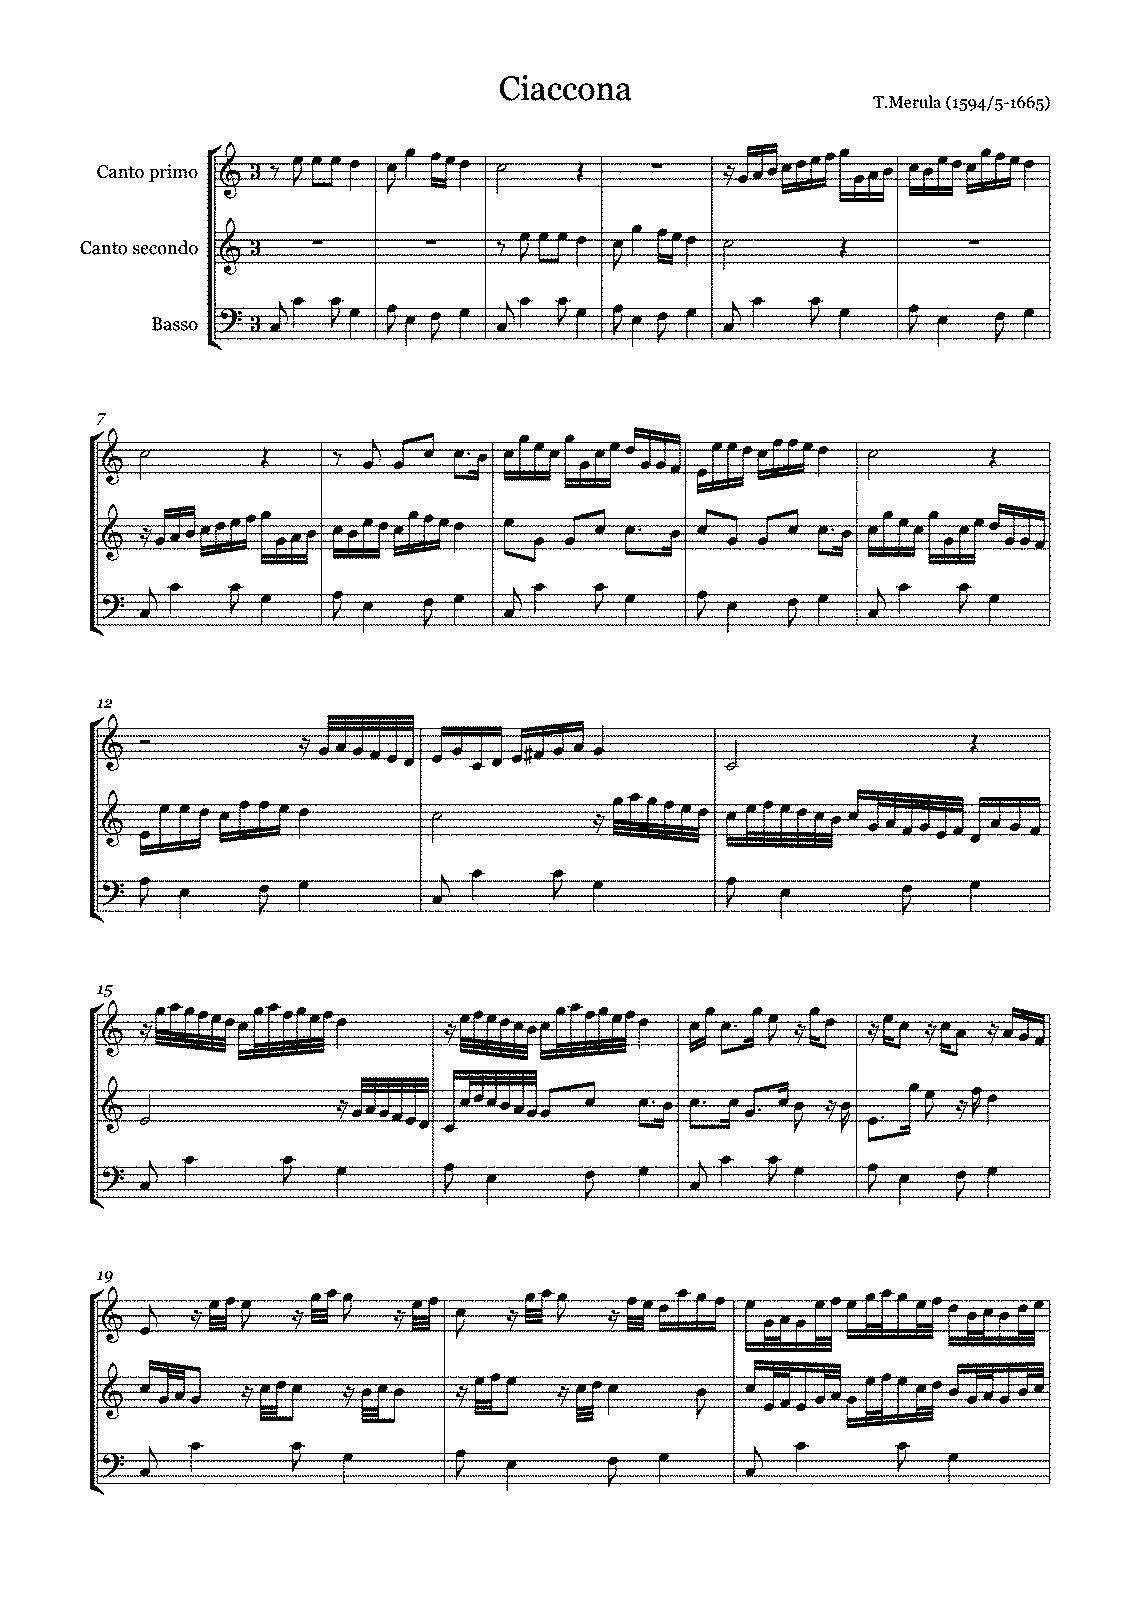 ciaccona op no merula tarquinio petrucci music  sheet music